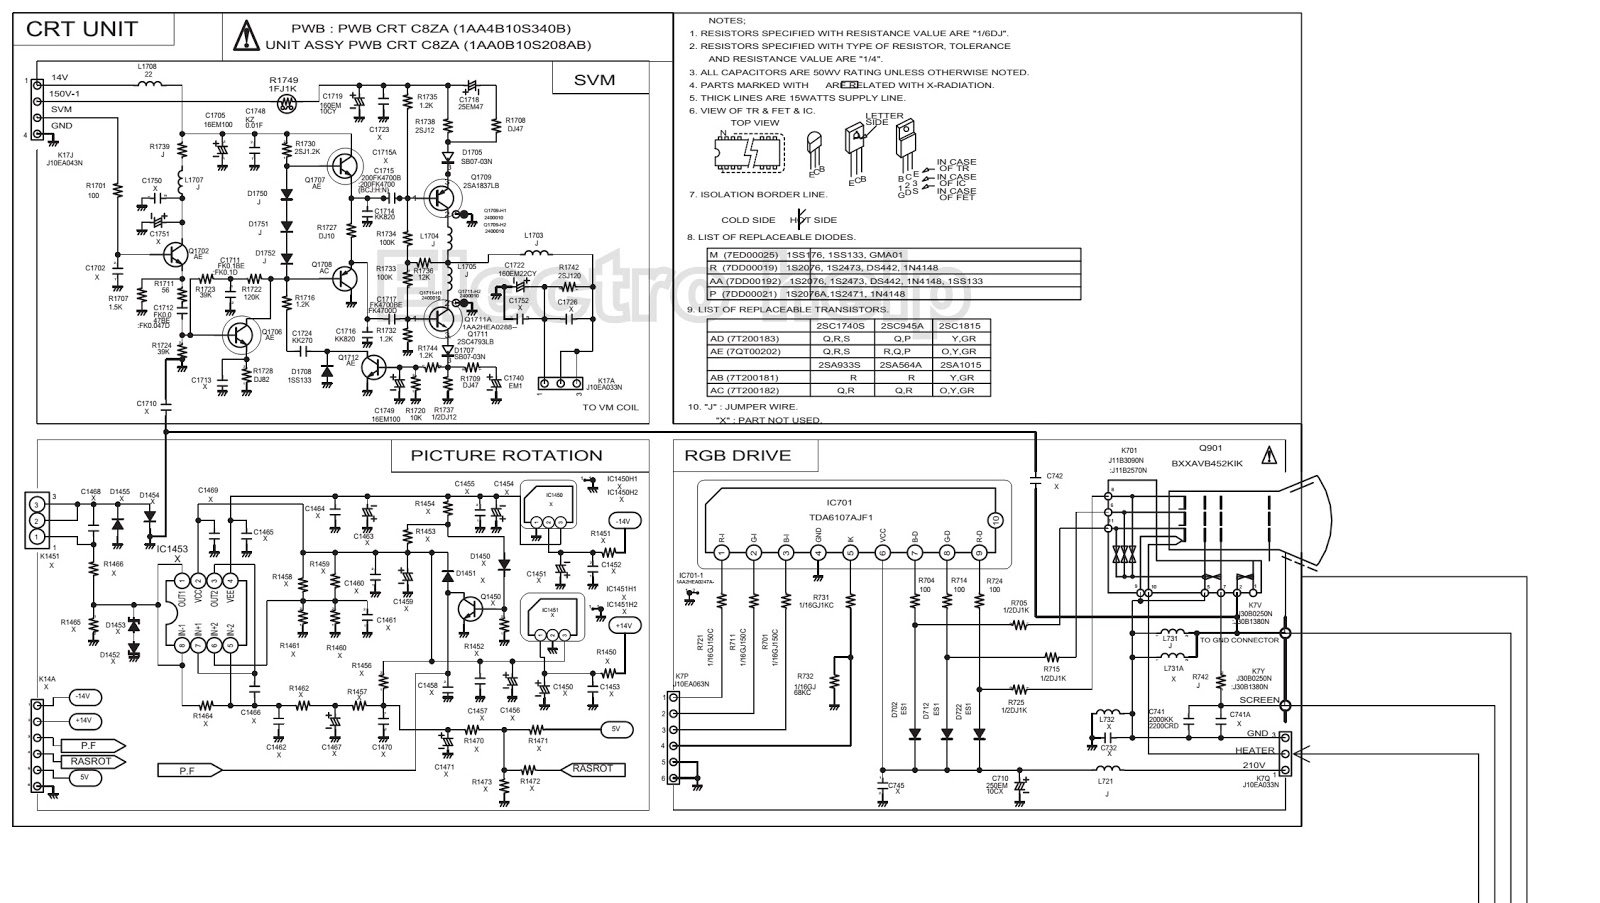 sanyo tv circuit diagram toshiba tv circuit diagram schematic ndash sanyo cm29fs2 ndash crt tv voltage chart